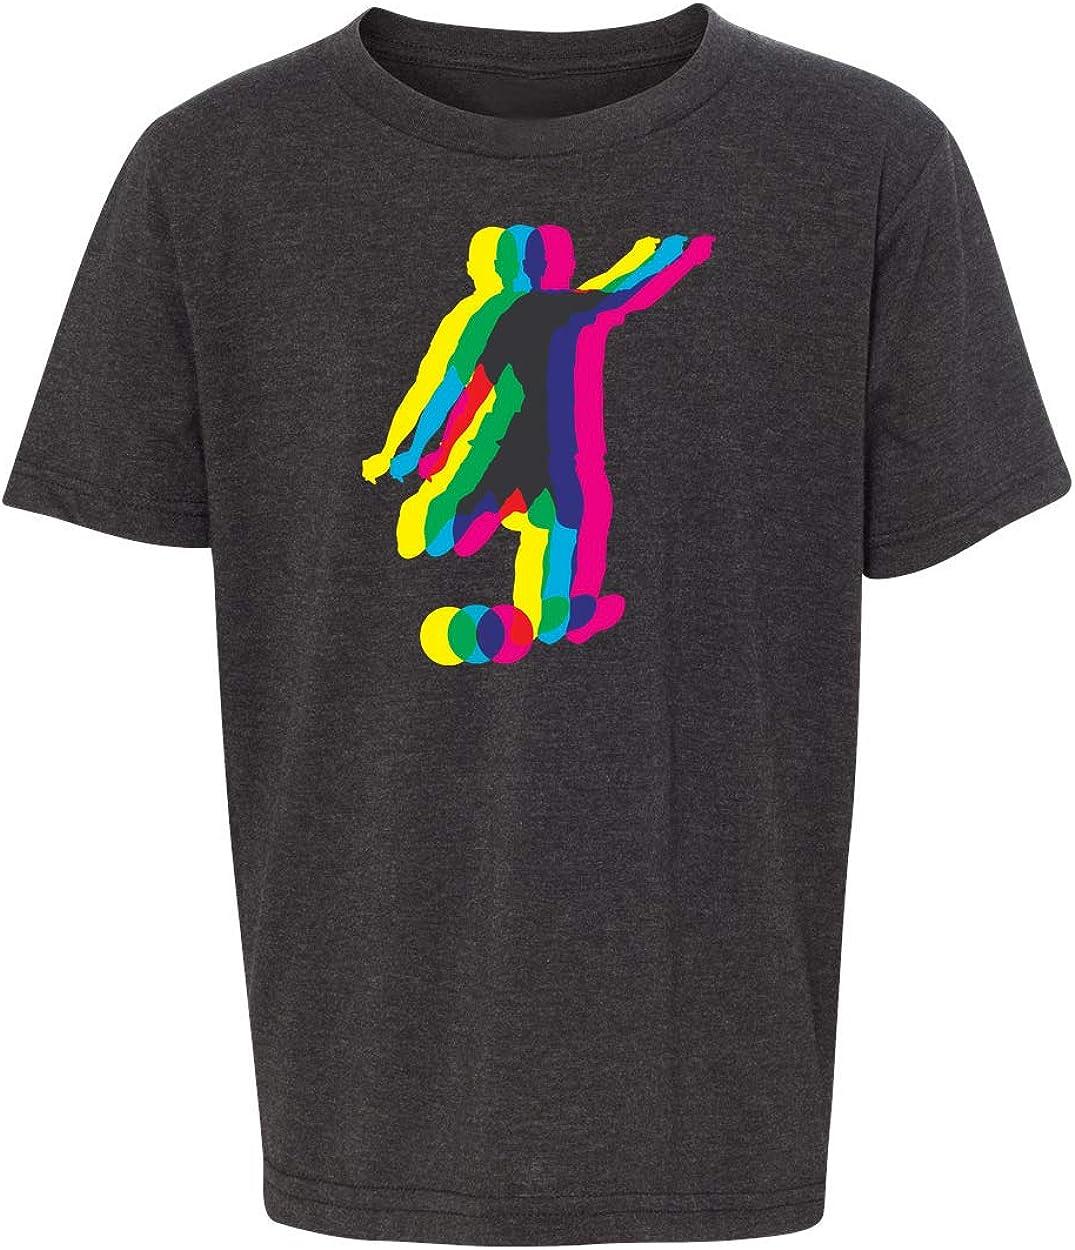 Soccer Player Kicking Ball Youth Soccer Shirt Graphic Sports T-Shirts